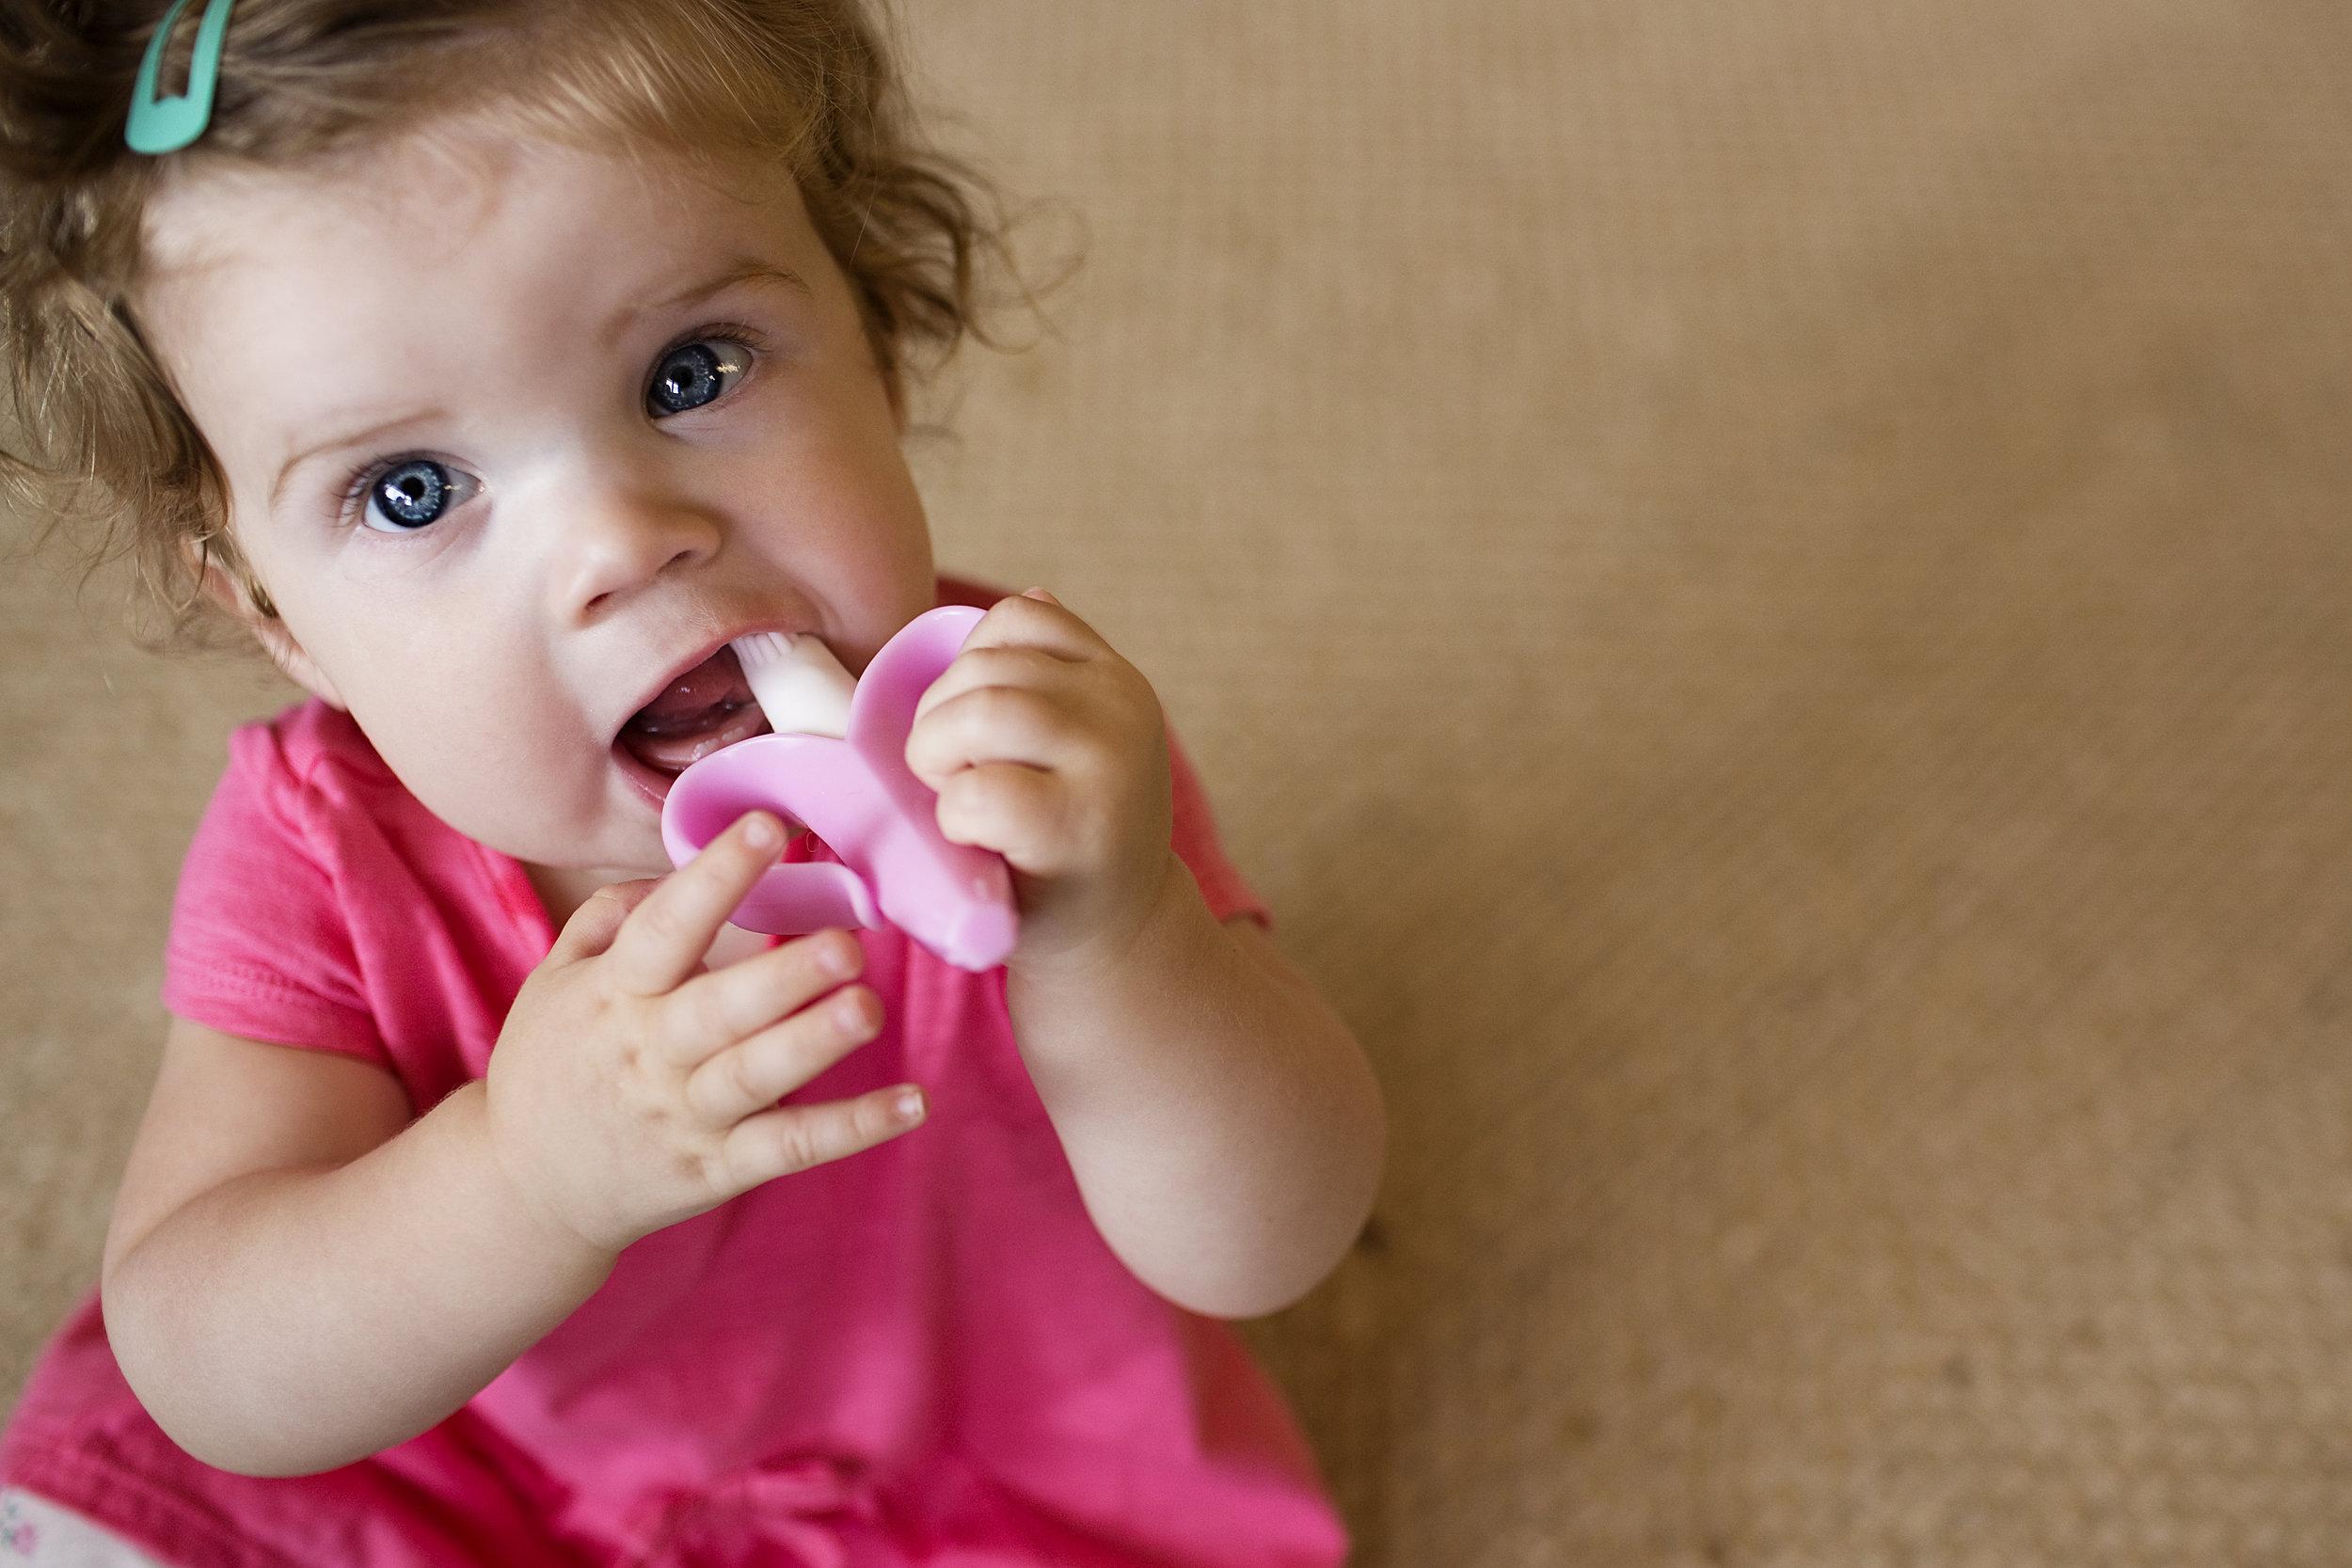 Pink Baby Banana Brush Roseville Lifestyle Photographer